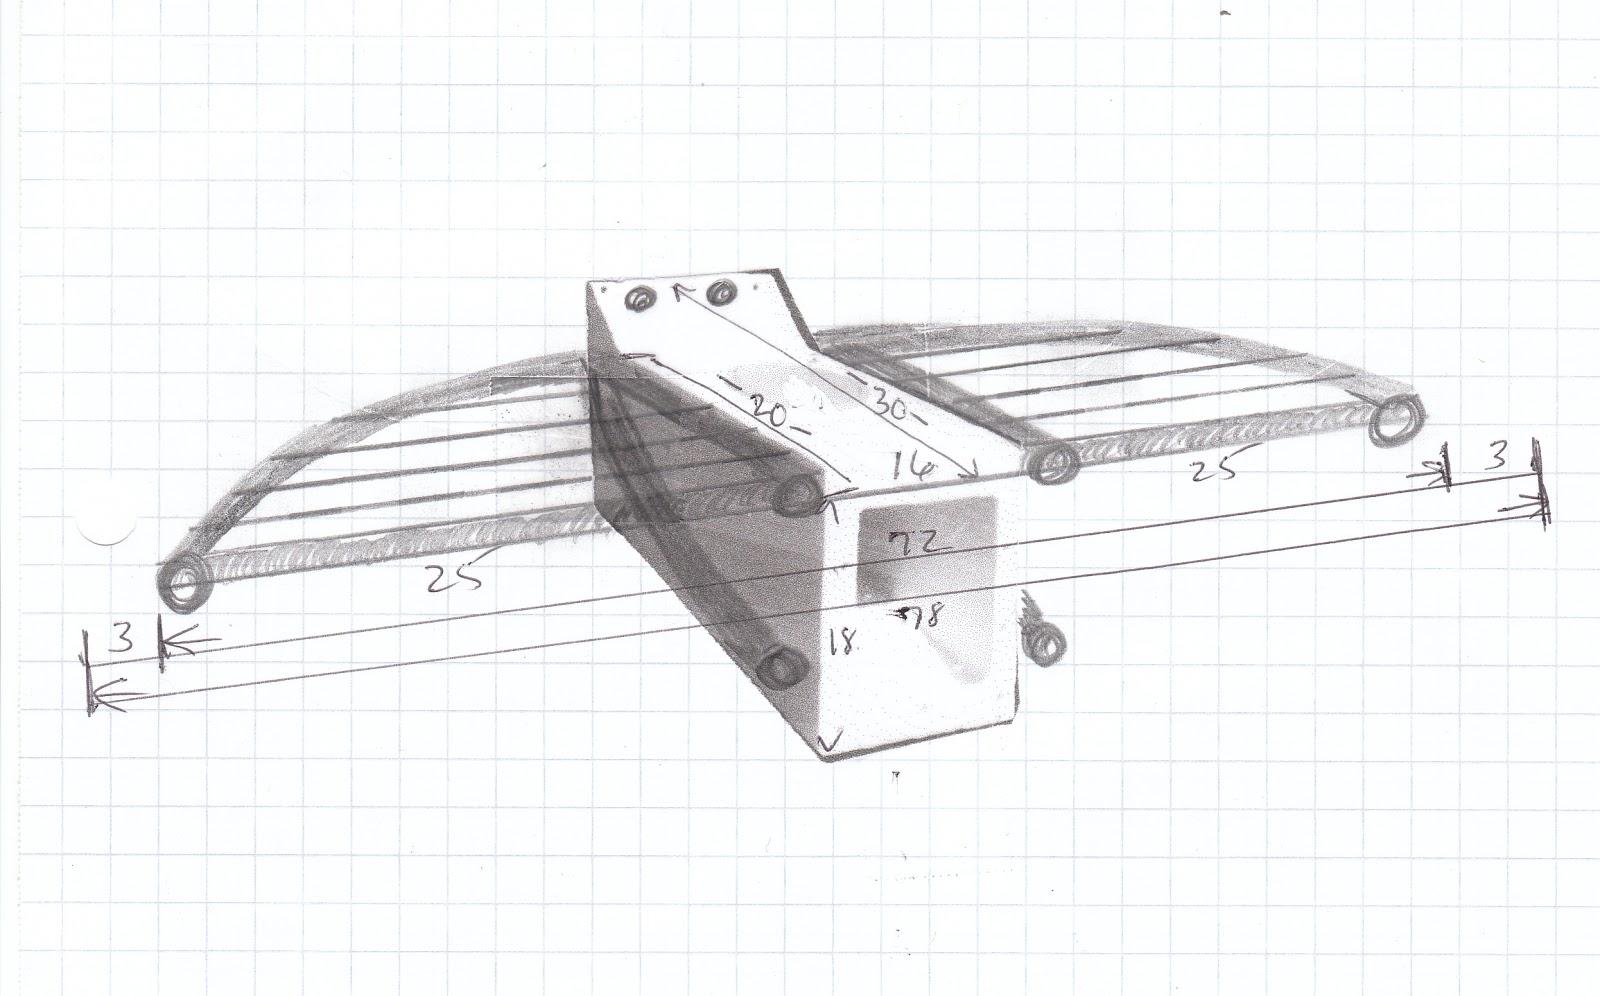 Engine Bracket And Swim Platform Final Design